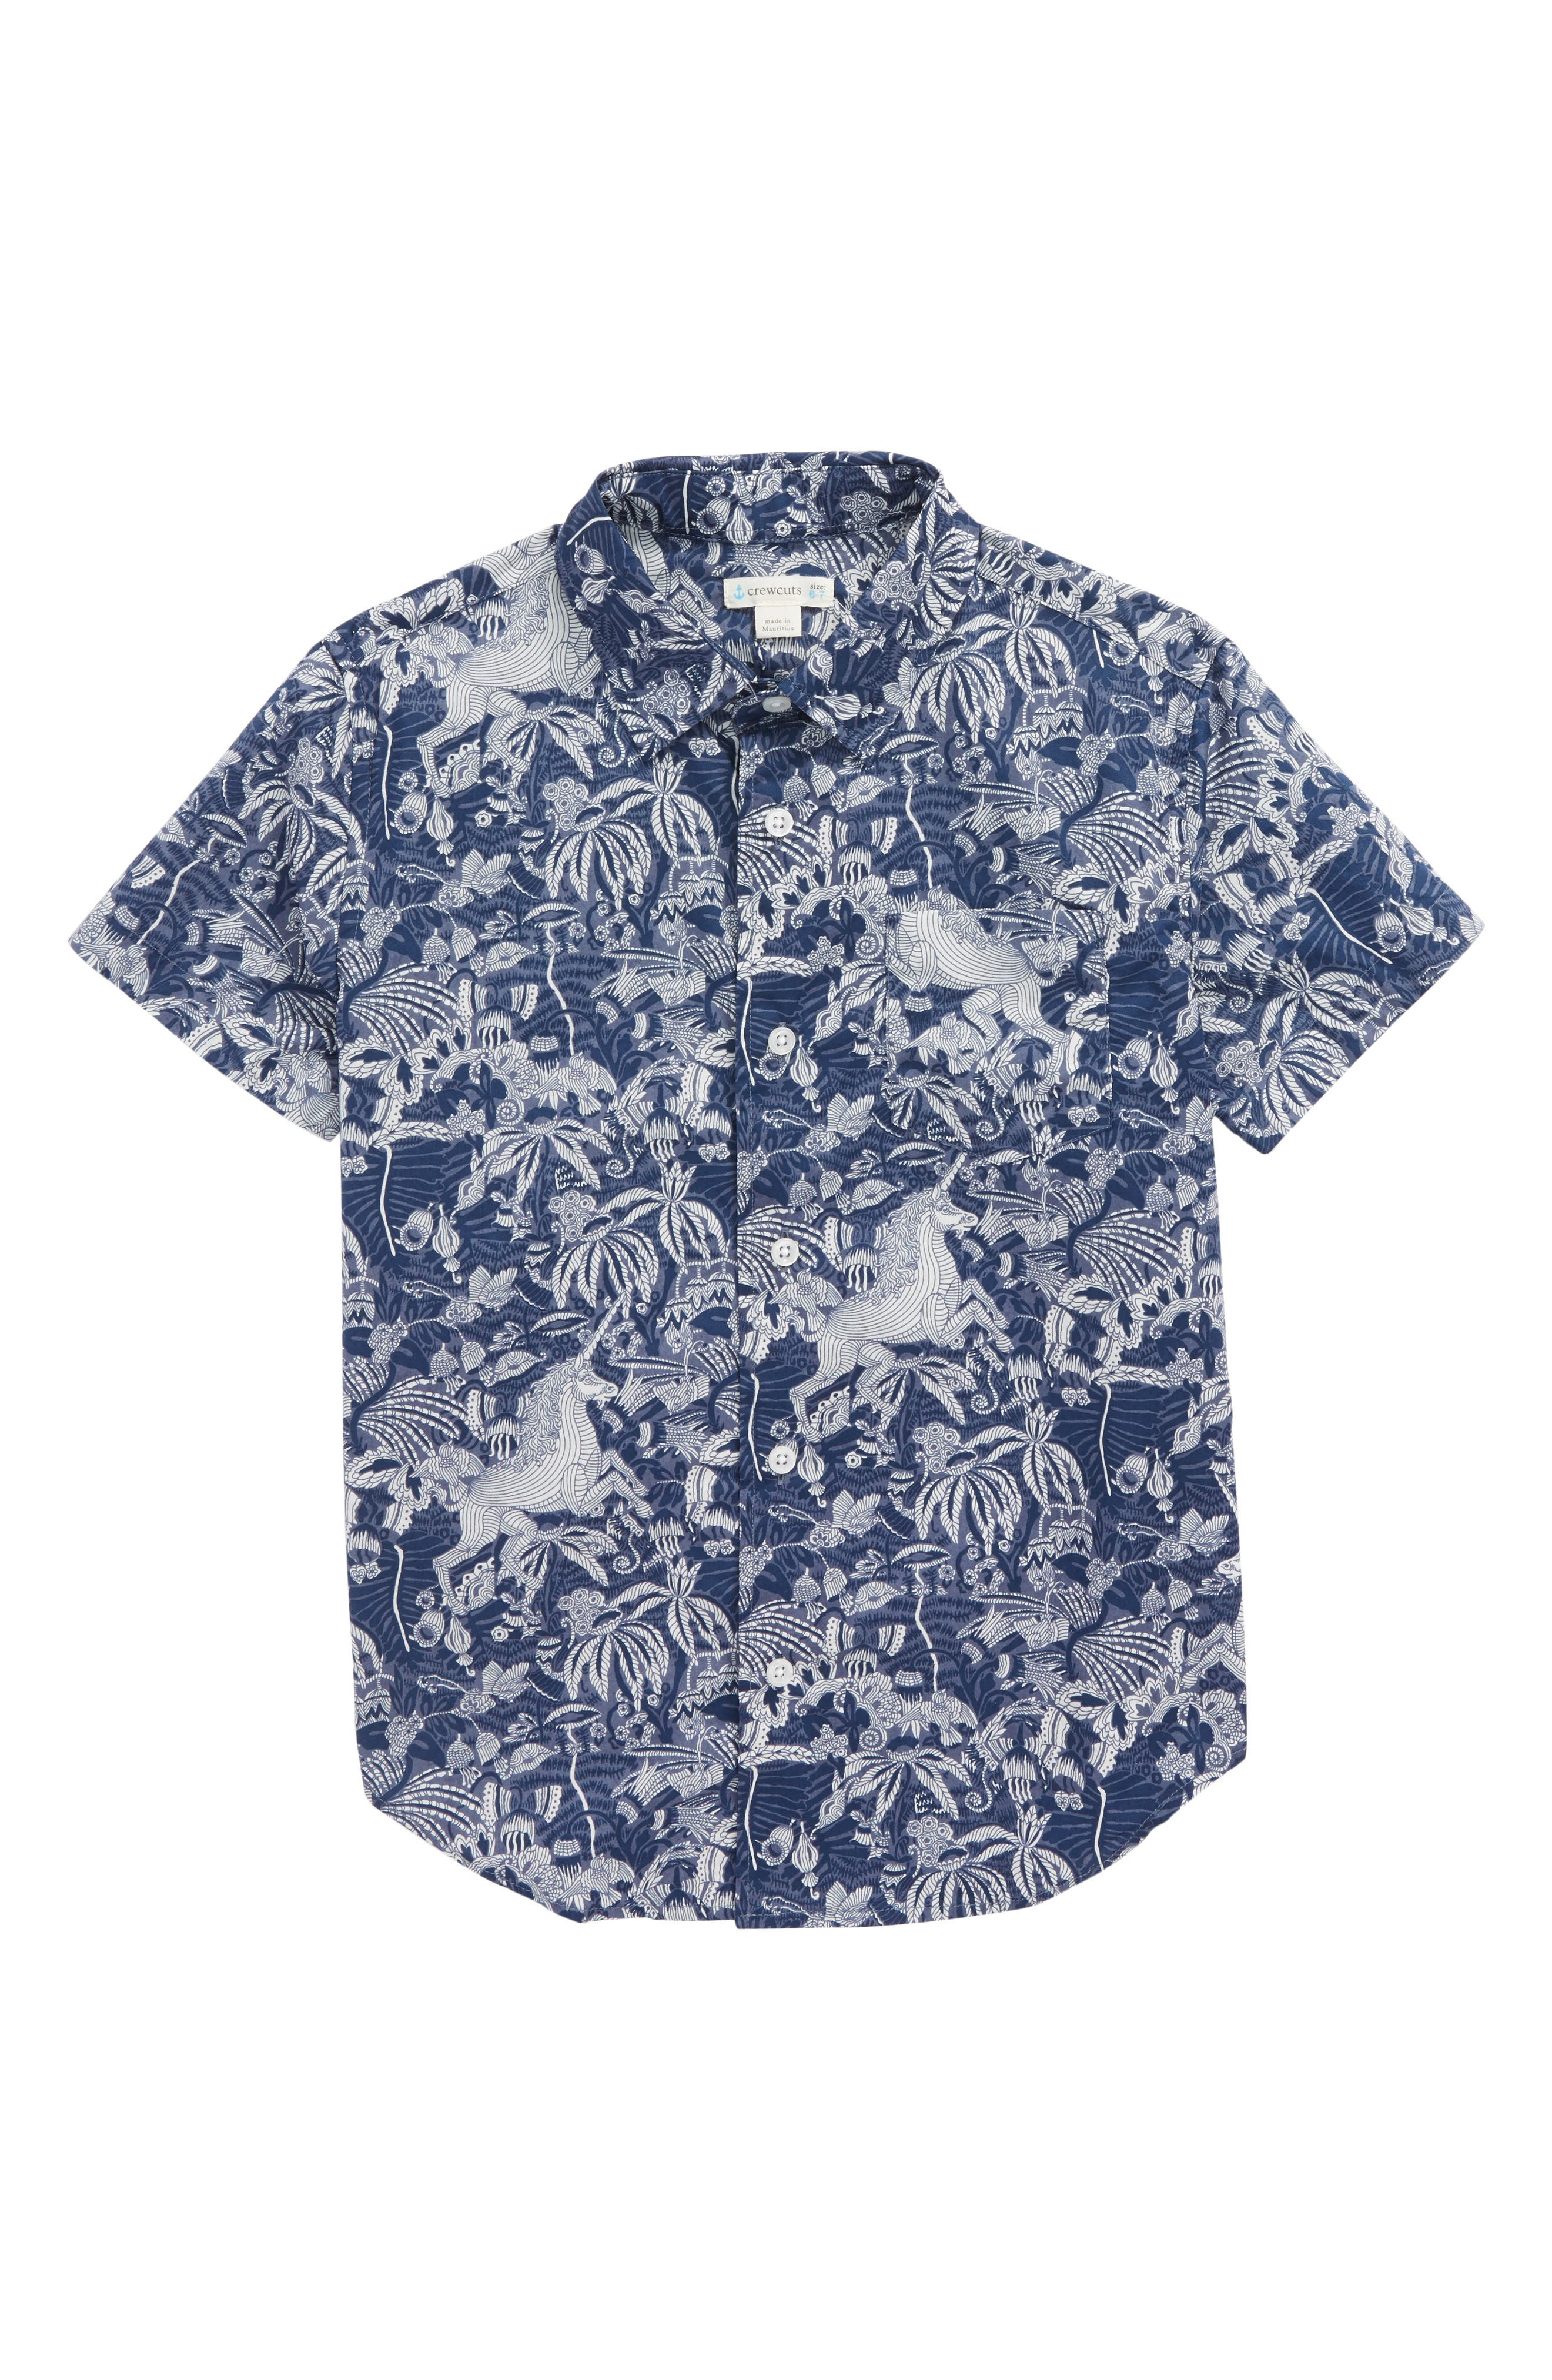 crewcuts by J.Crew Jungle Unicorn Print Woven Shirt (Toddler Boys, Little Boys & Big Boys)